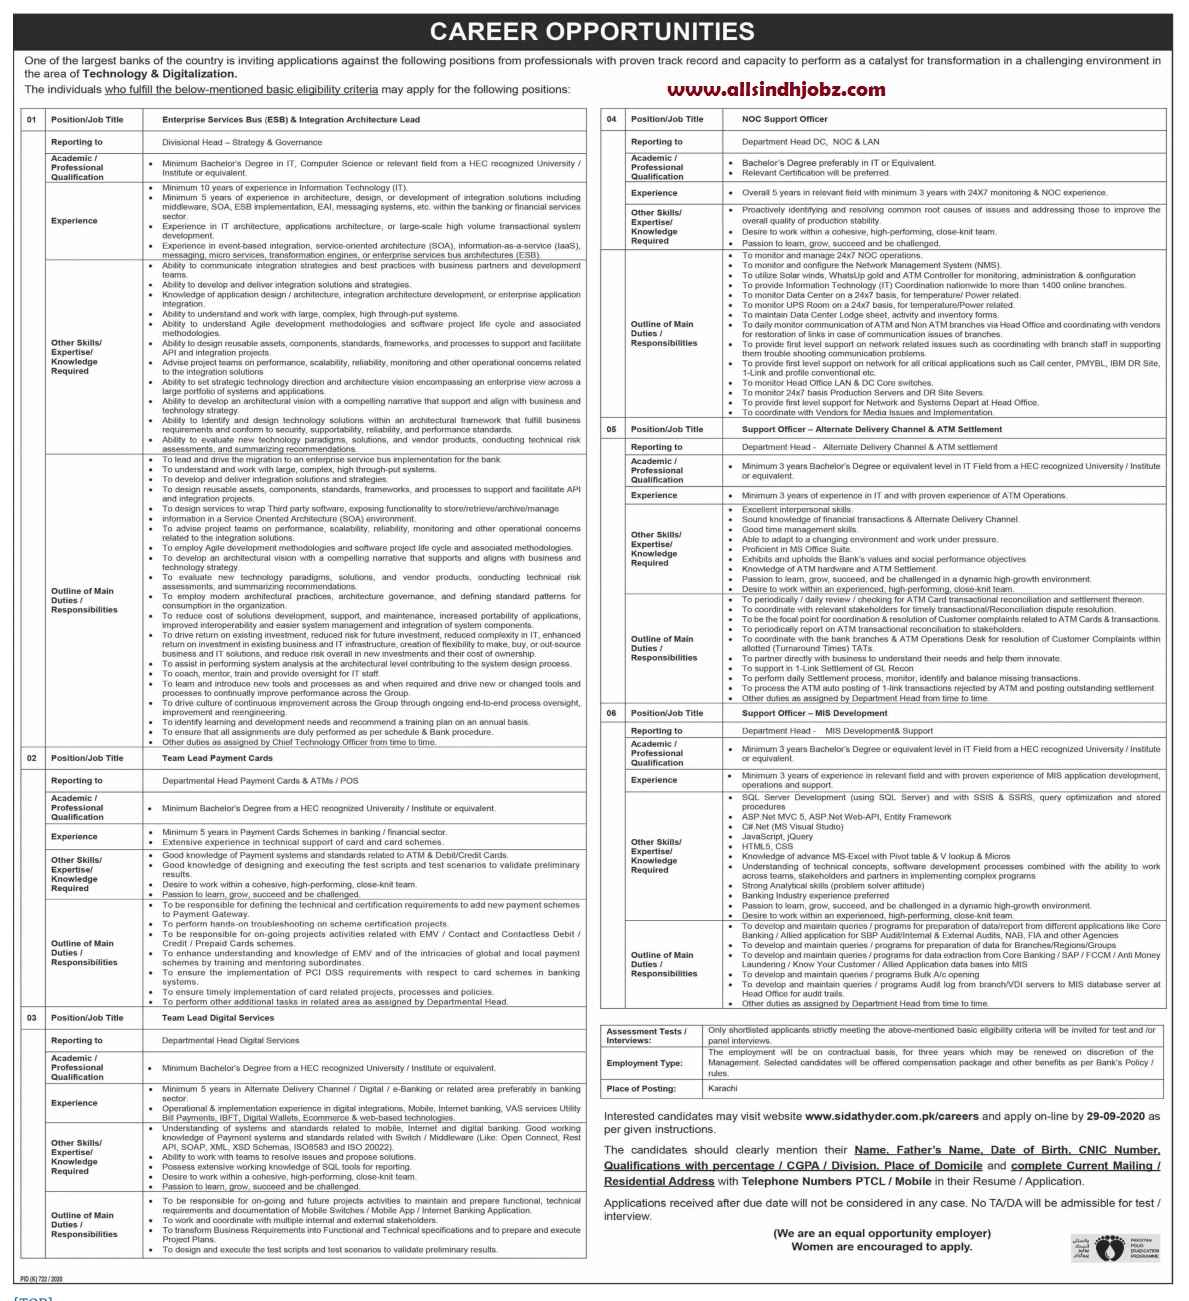 Latest National Bank of Pakistan Jobs 2020 | Sidathyder.com.pk